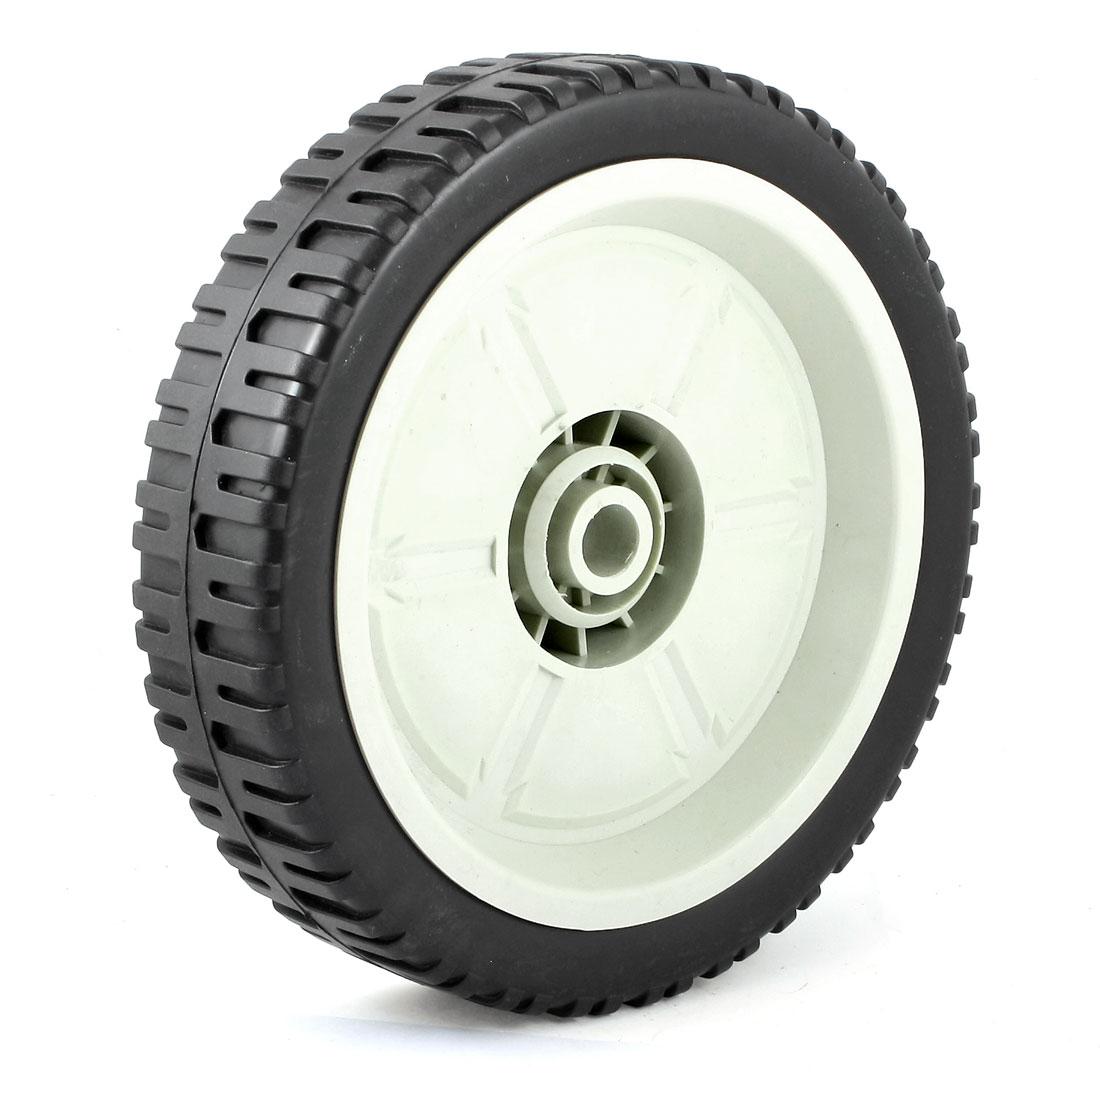 Garden Lawn Tubeless Turf Saver Tire Lawnmower Wheel Gray Black 20cm x 4.7cm